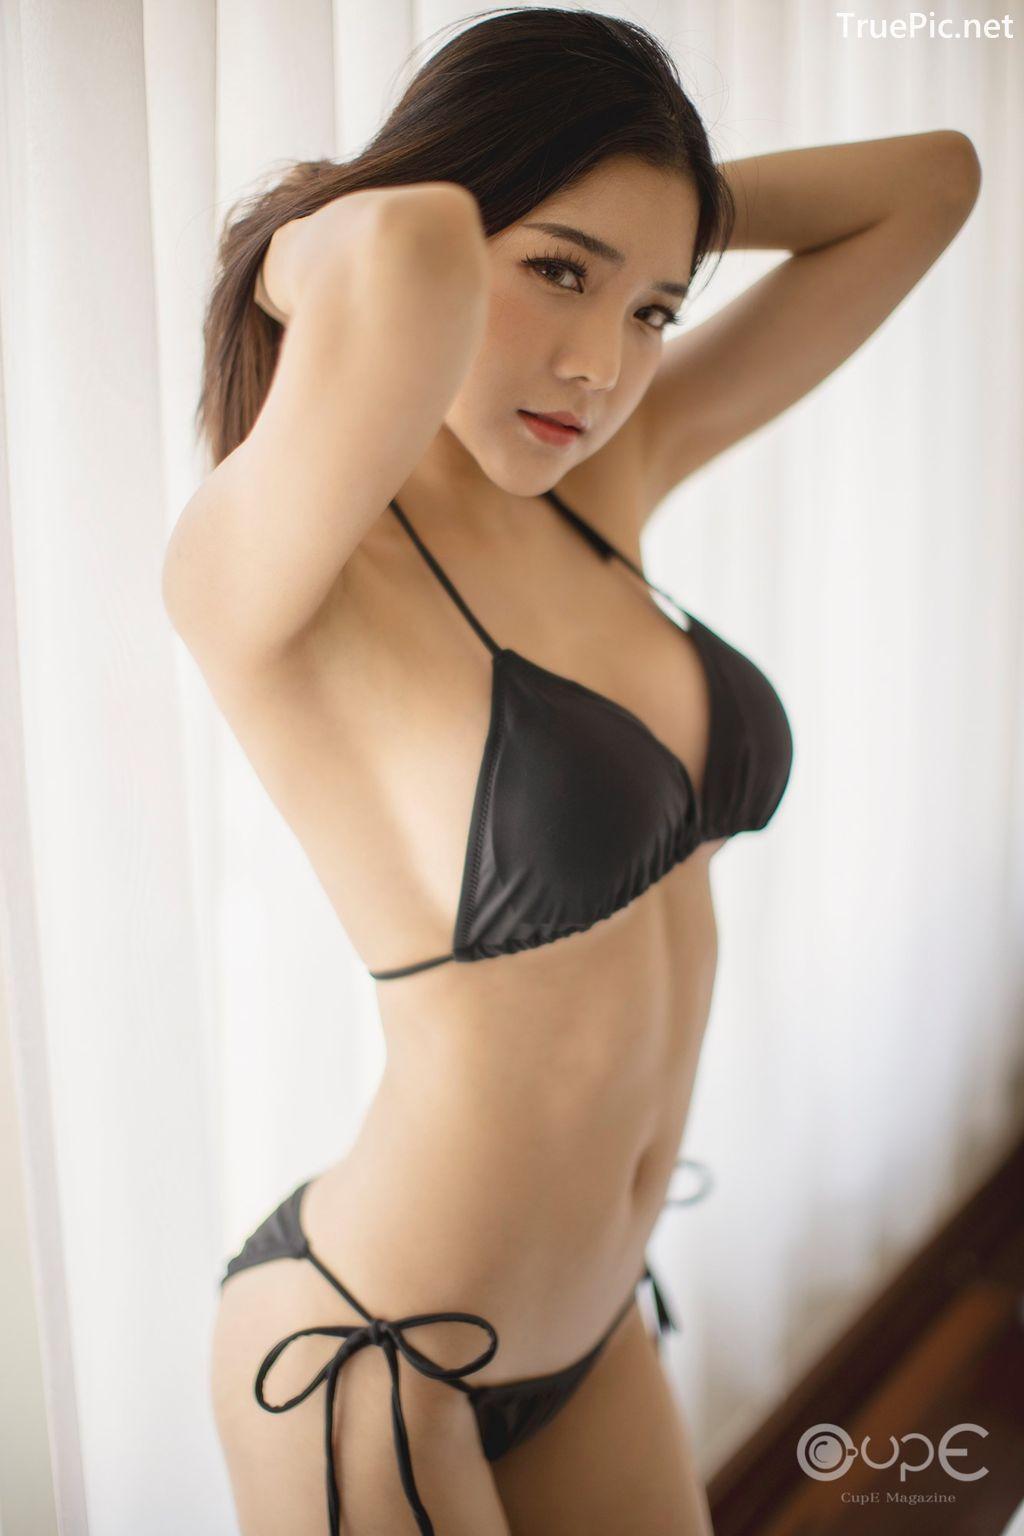 Image-Thailand-Model-Phitchamol-Srijantanet-Black-Bikini-TruePic.net- Picture-7